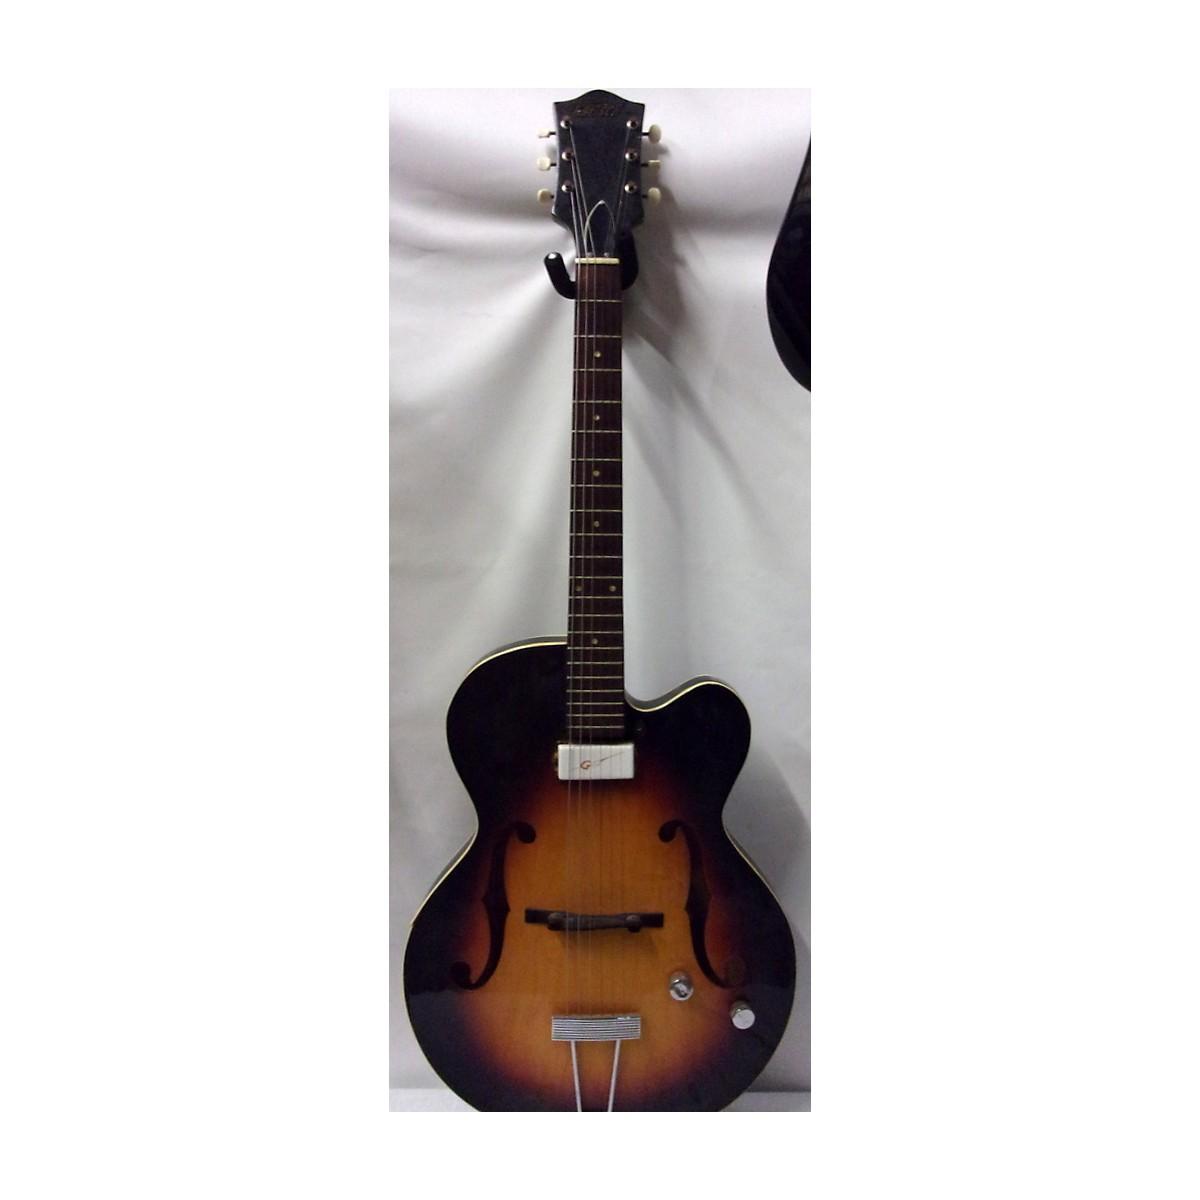 Gretsch Guitars 1960s 6186 Hollow Body Electric Guitar